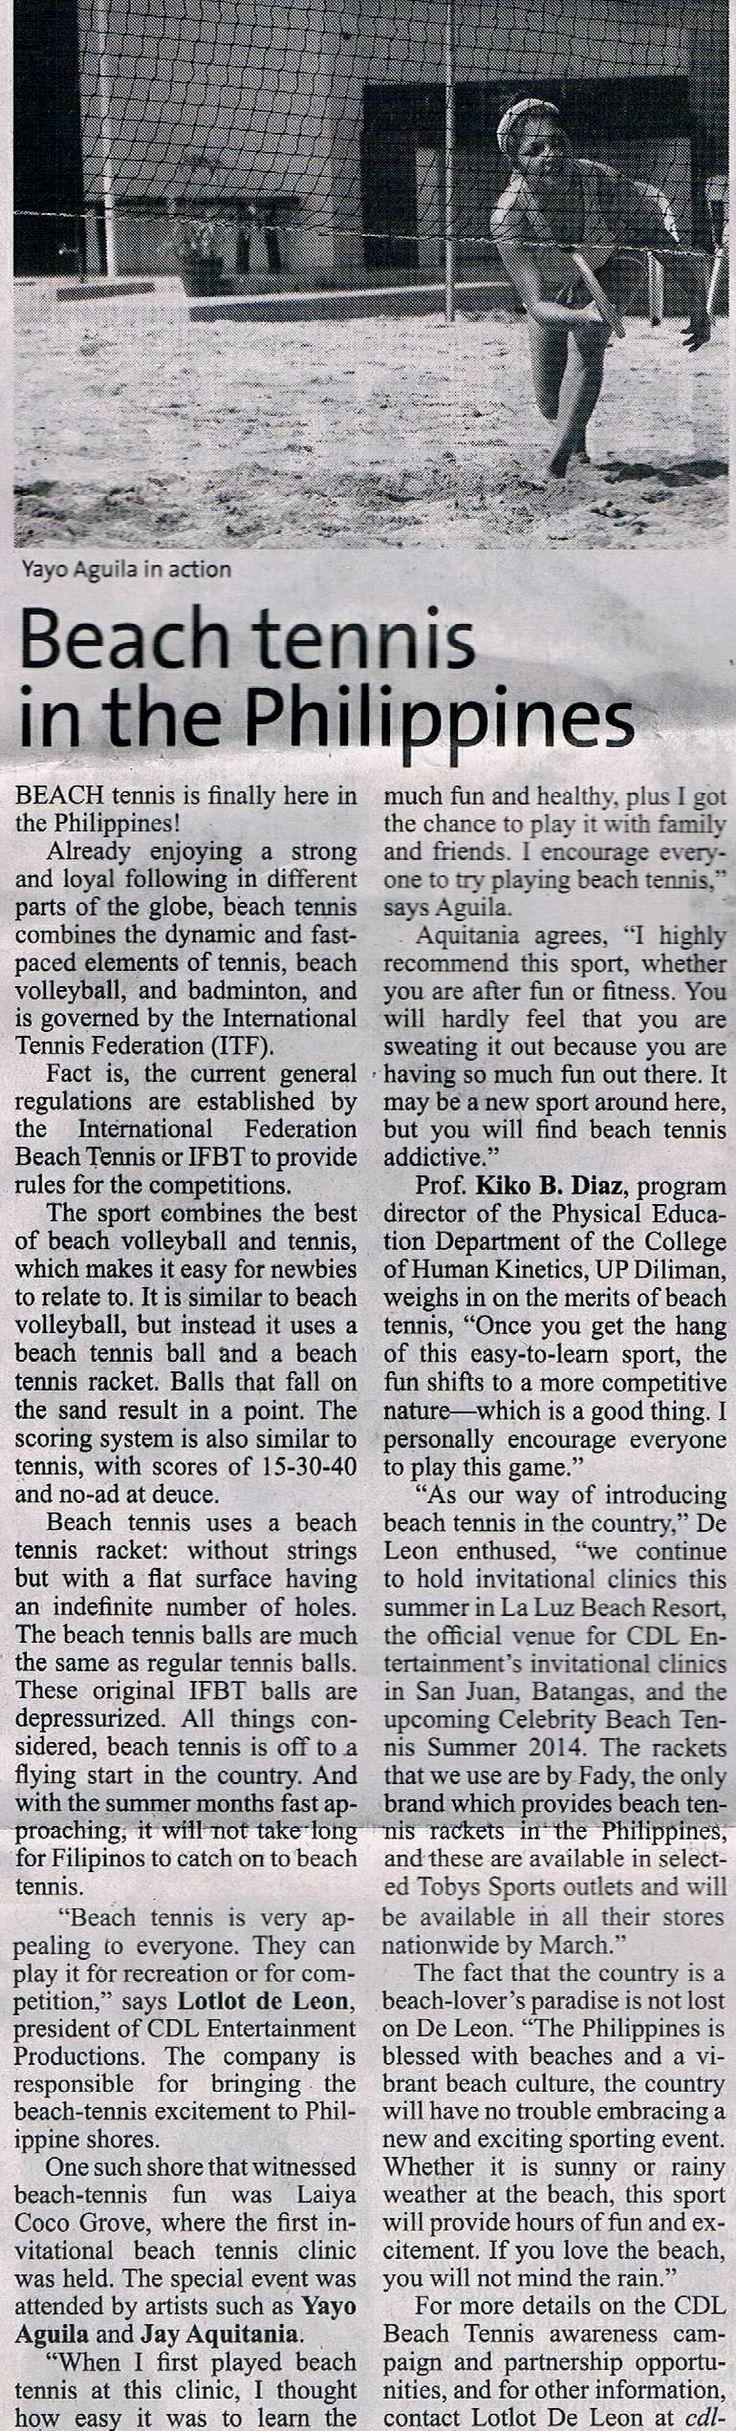 http://manilastandardtoday.com/2014/06/05/beach-tennis-in-the-philippines  June 5 online June 6 newspaper